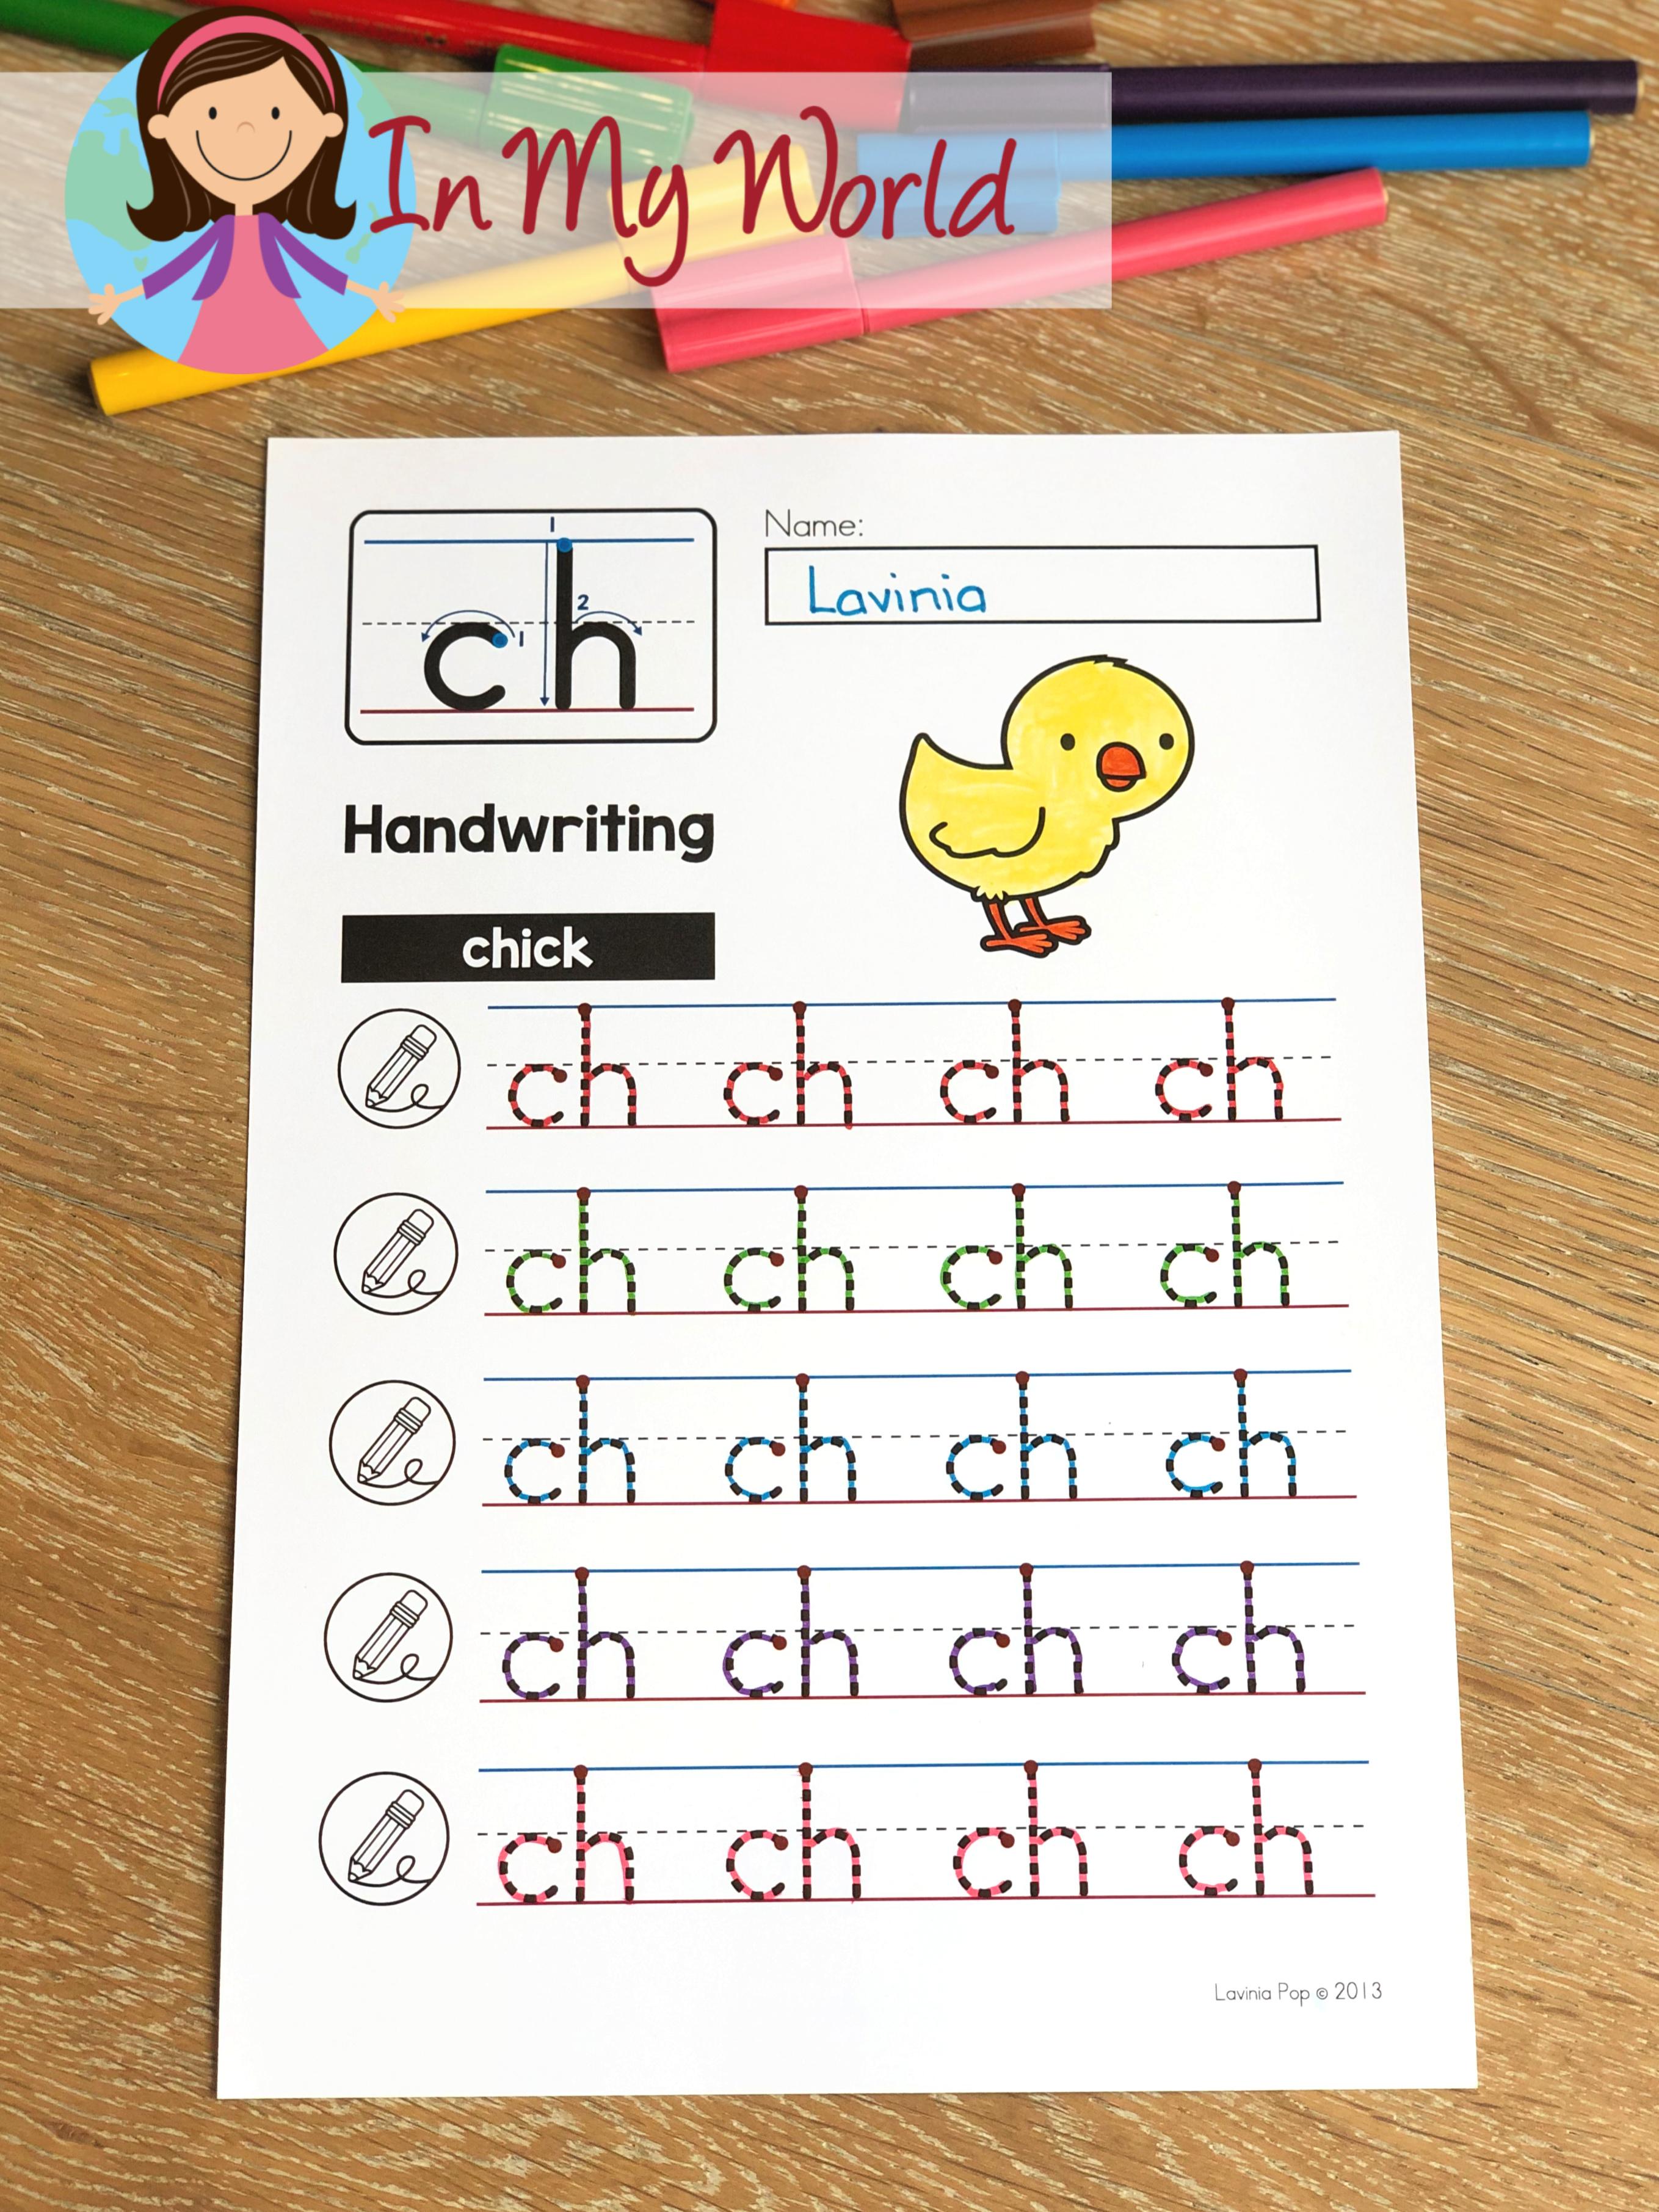 Handwriting Worksheet